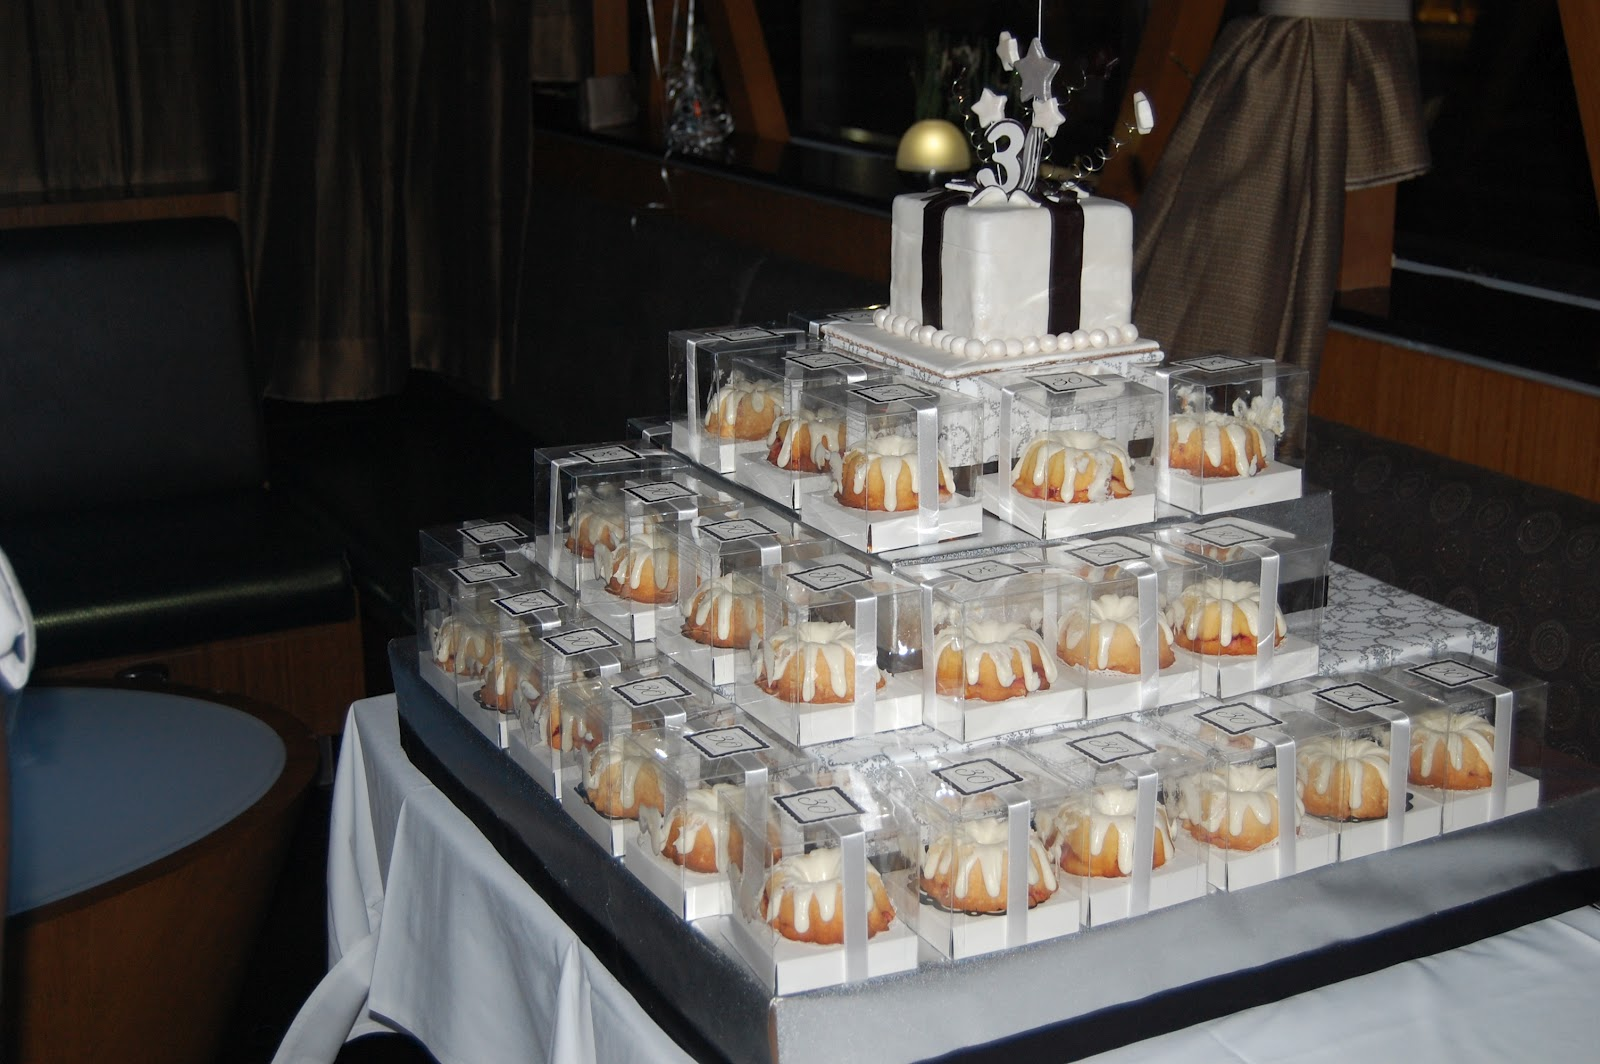 Incredibundts Amp More Mini Bundt Tower And Gift Box Cake